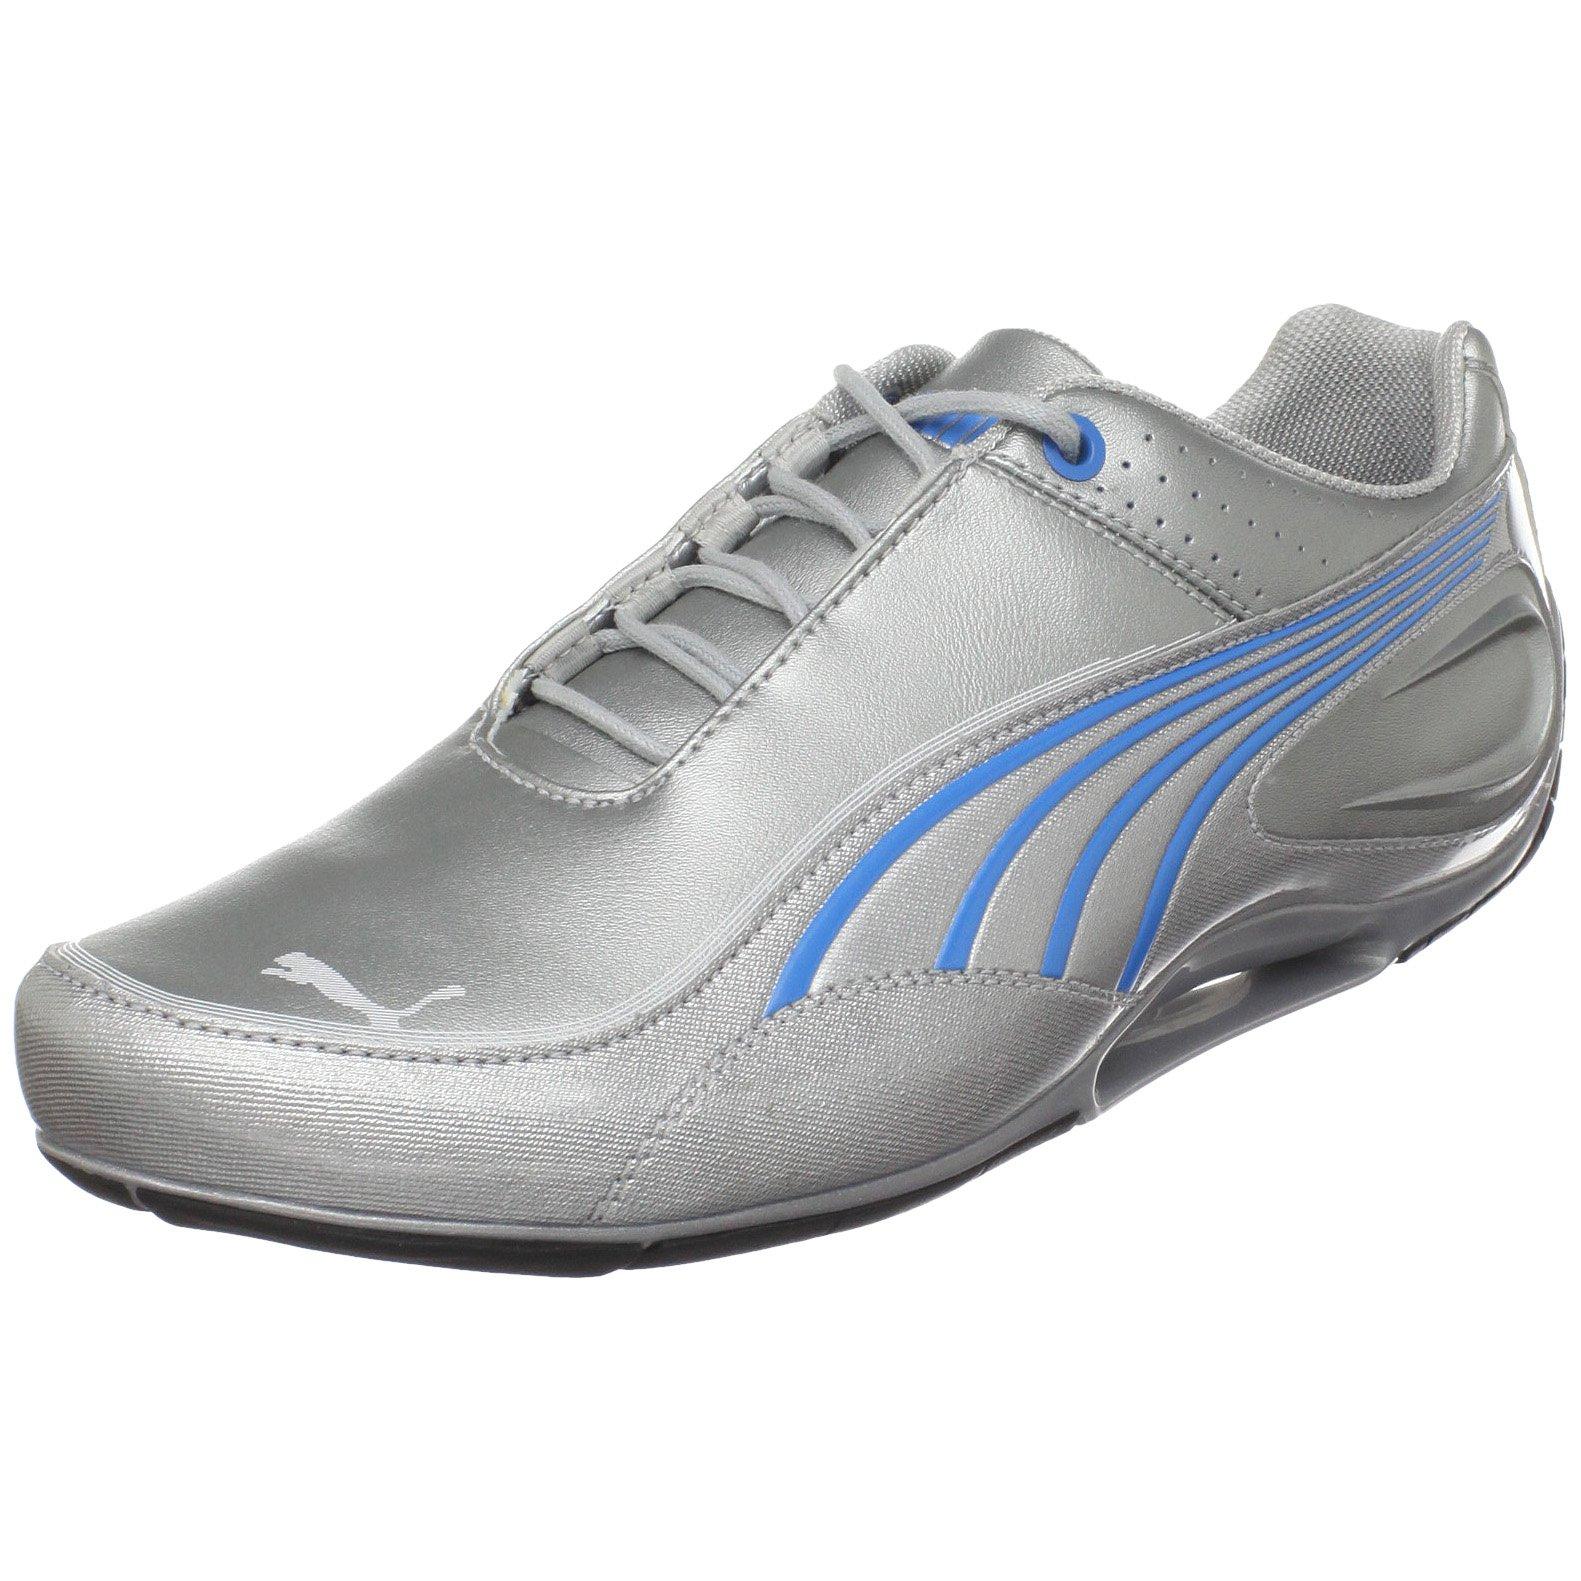 PUMA Unisex Tech LO NM Basic Sneaker,Puma Silver/Puma Silver/Diva,US Women's 12.5 B/US Men's 11 D